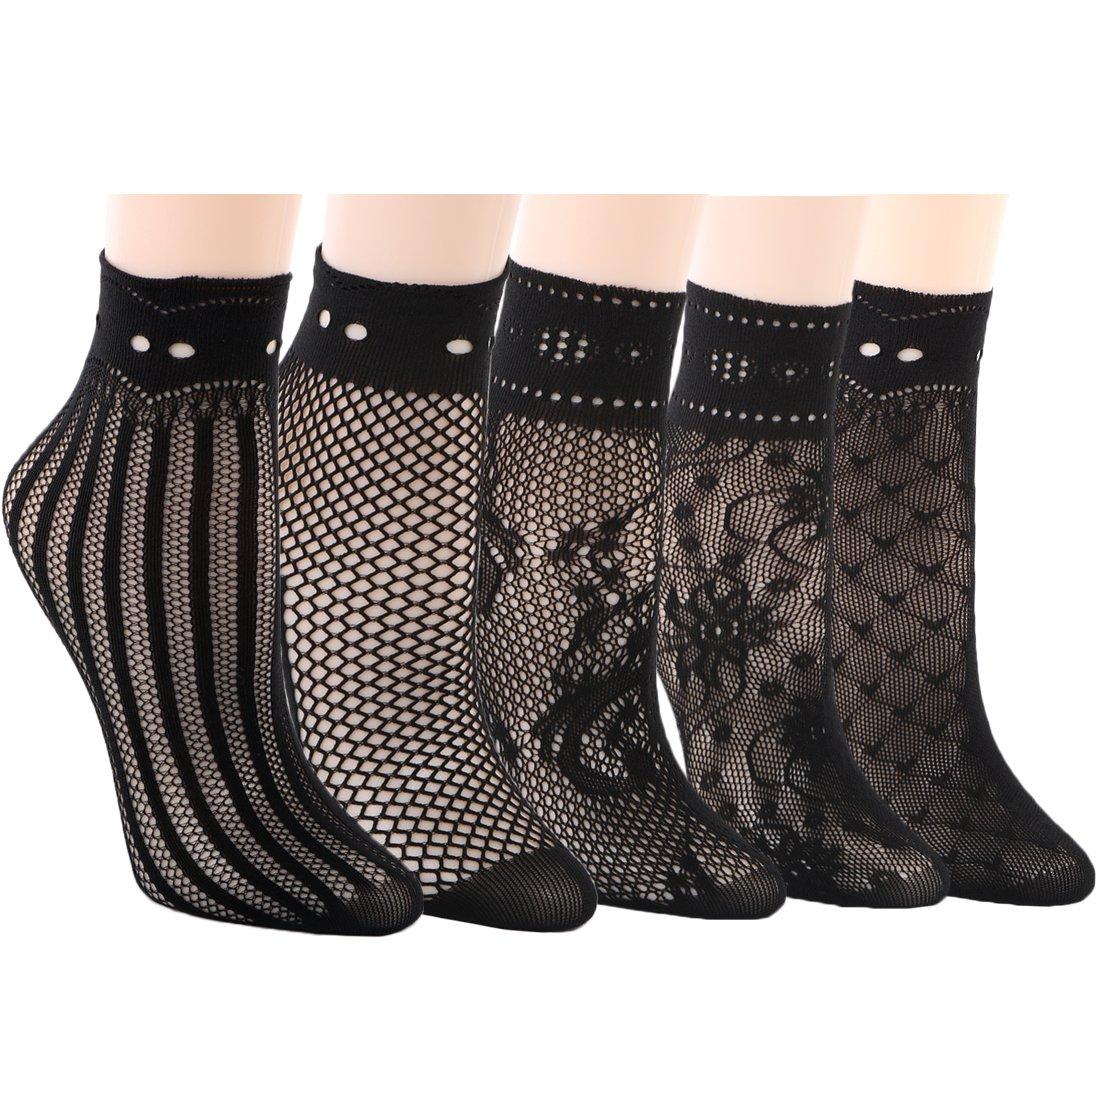 kilofly 5 Pairs Women Ultra Thin Short Ankle Socks Fishnet Lace Liner Stockings FTW525set5